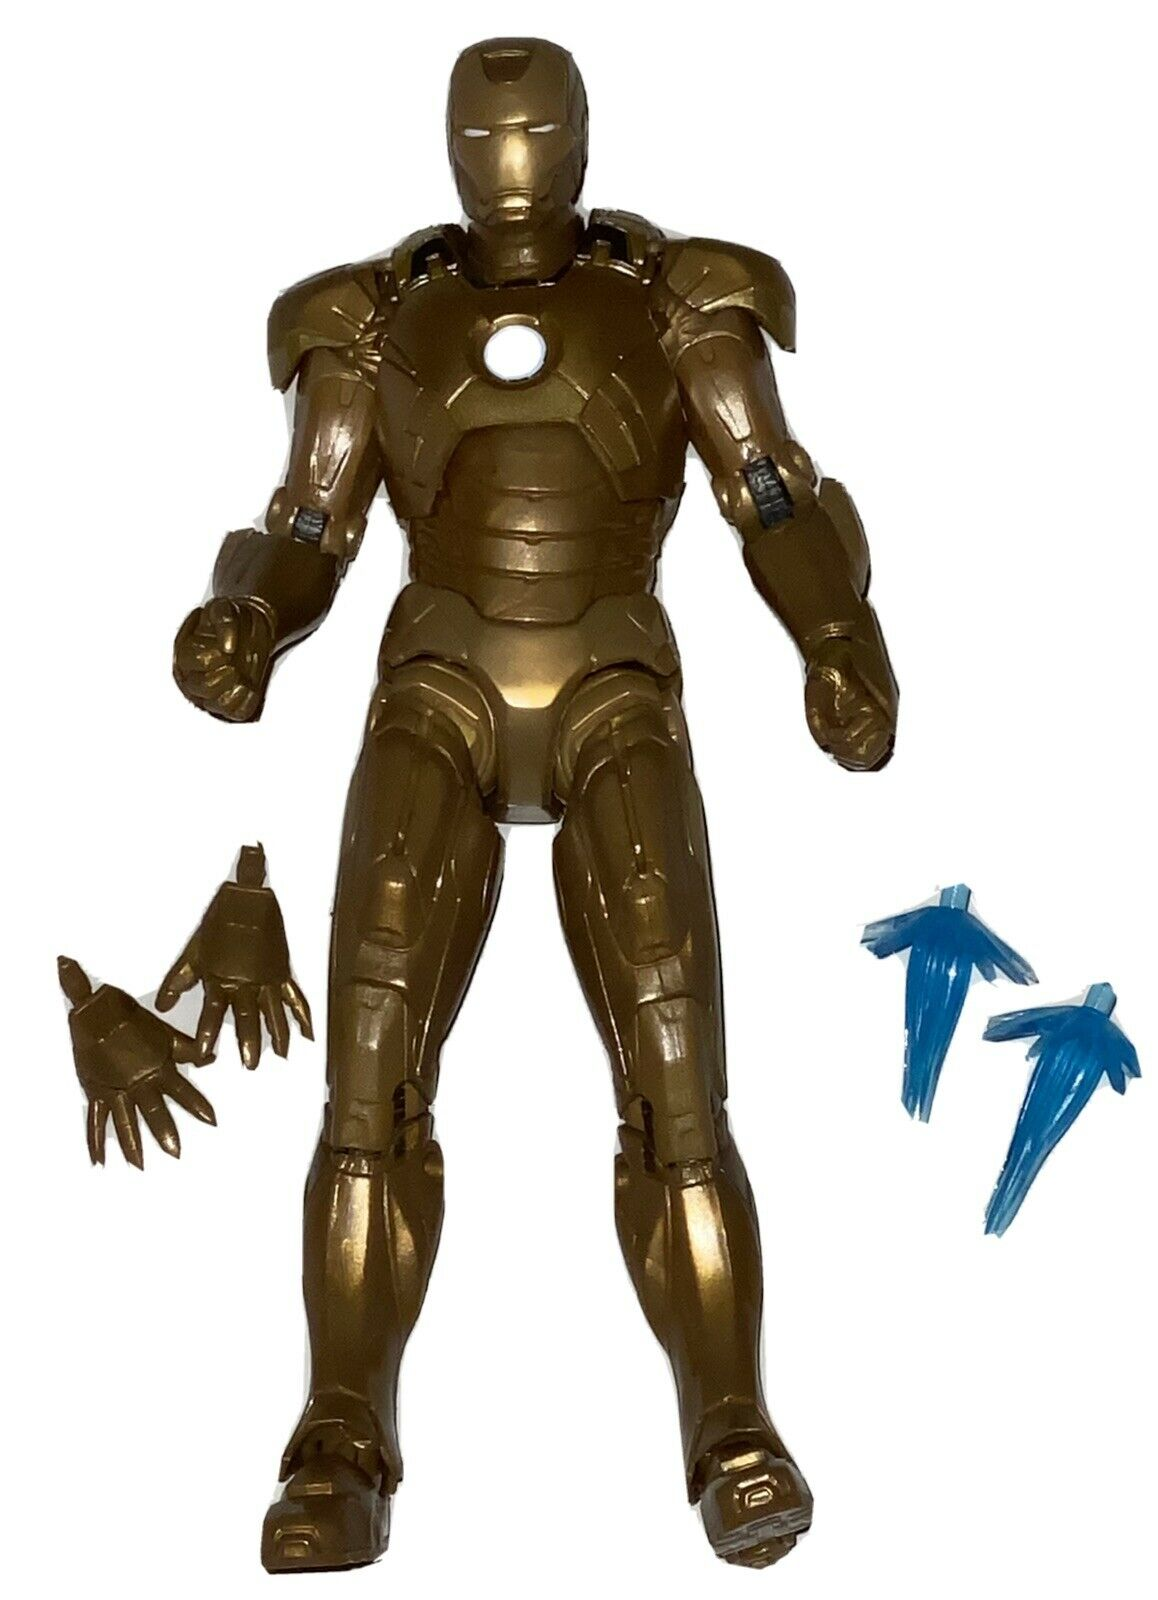 2021 Marvel Studios IRON MAN 3 MARK XXI LOOSE ACTION FIGURE Gold Hasbro Legends on eBay thumbnail